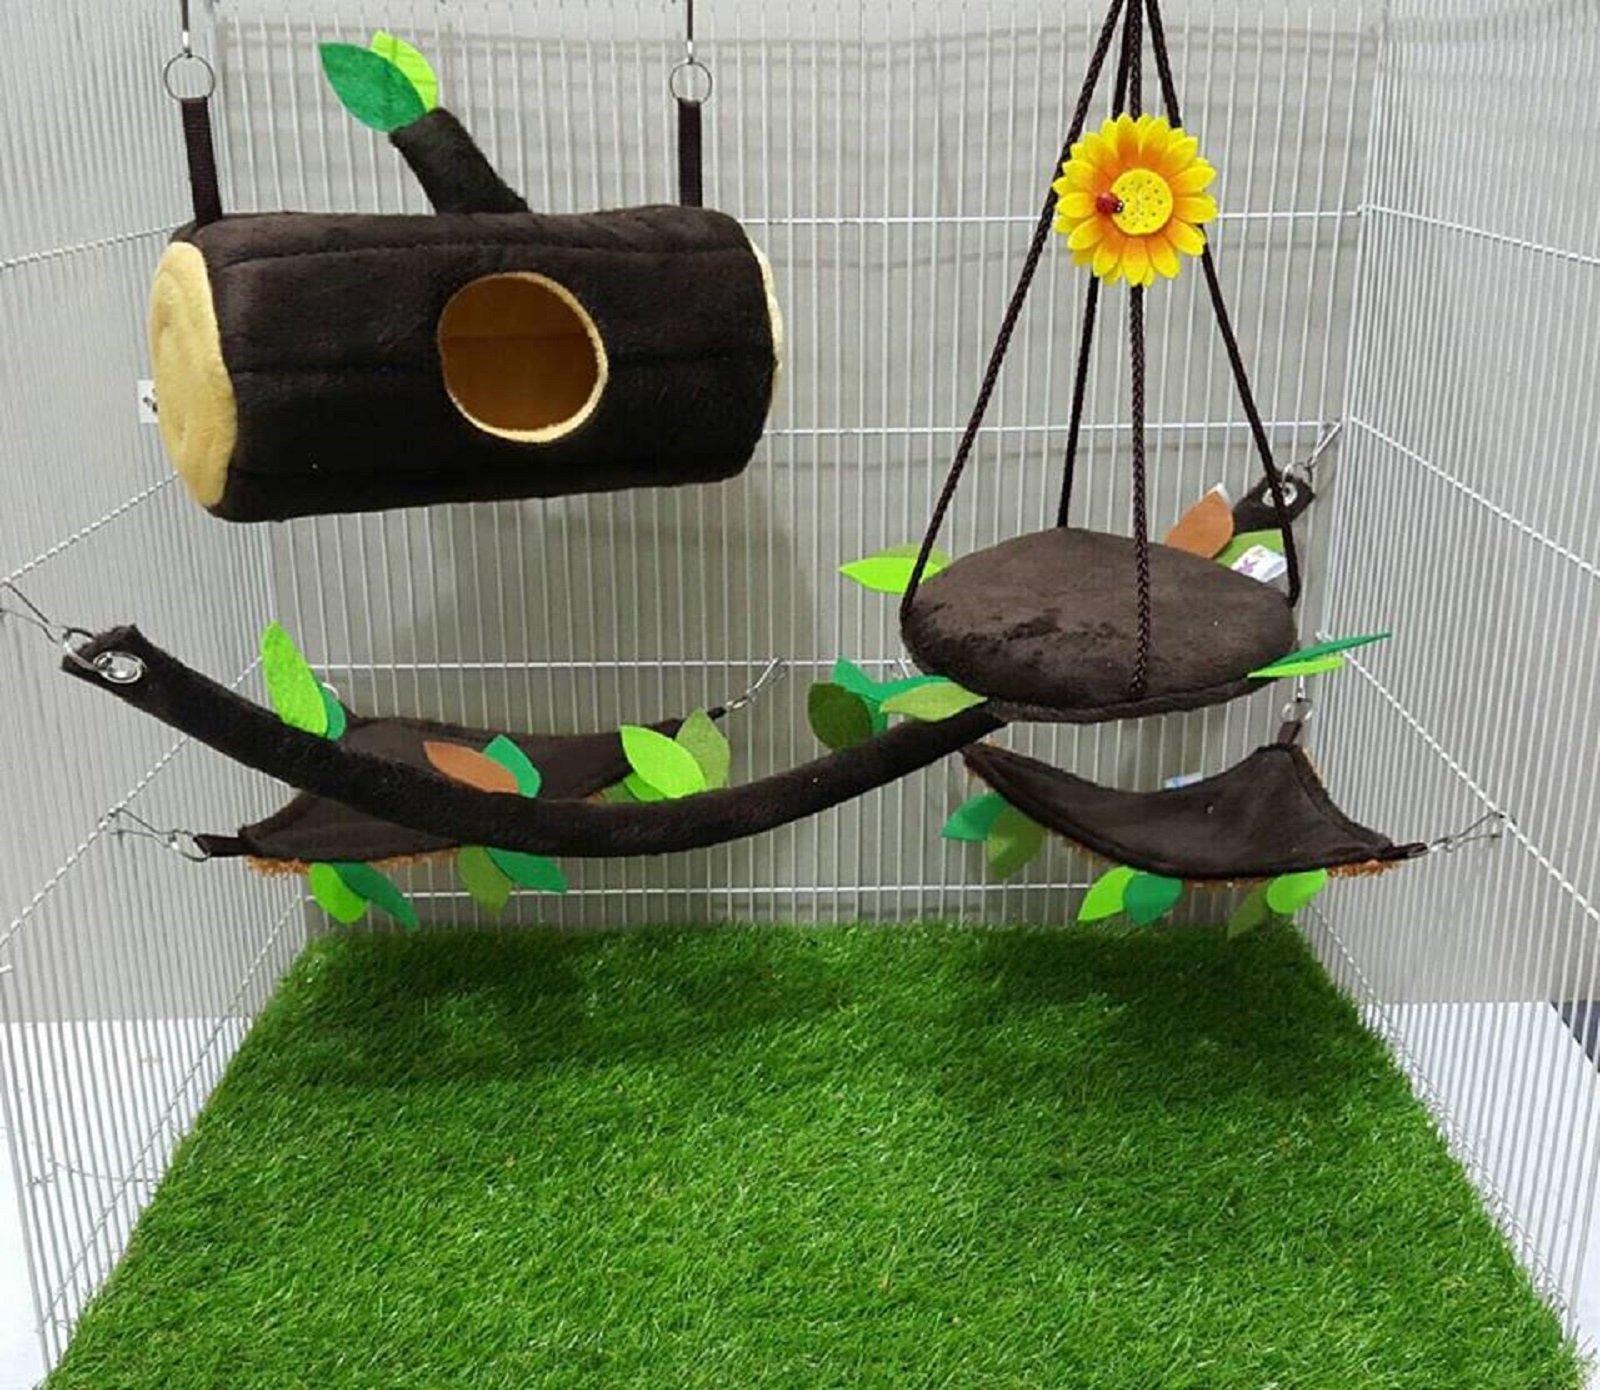 5 Pcs Sugar Glider Hamster Squirrel Chinchillas Small Pet Log Cage Set Forest Pattern Get Free 1 Small Pet Treats, Polar Bear's Republic